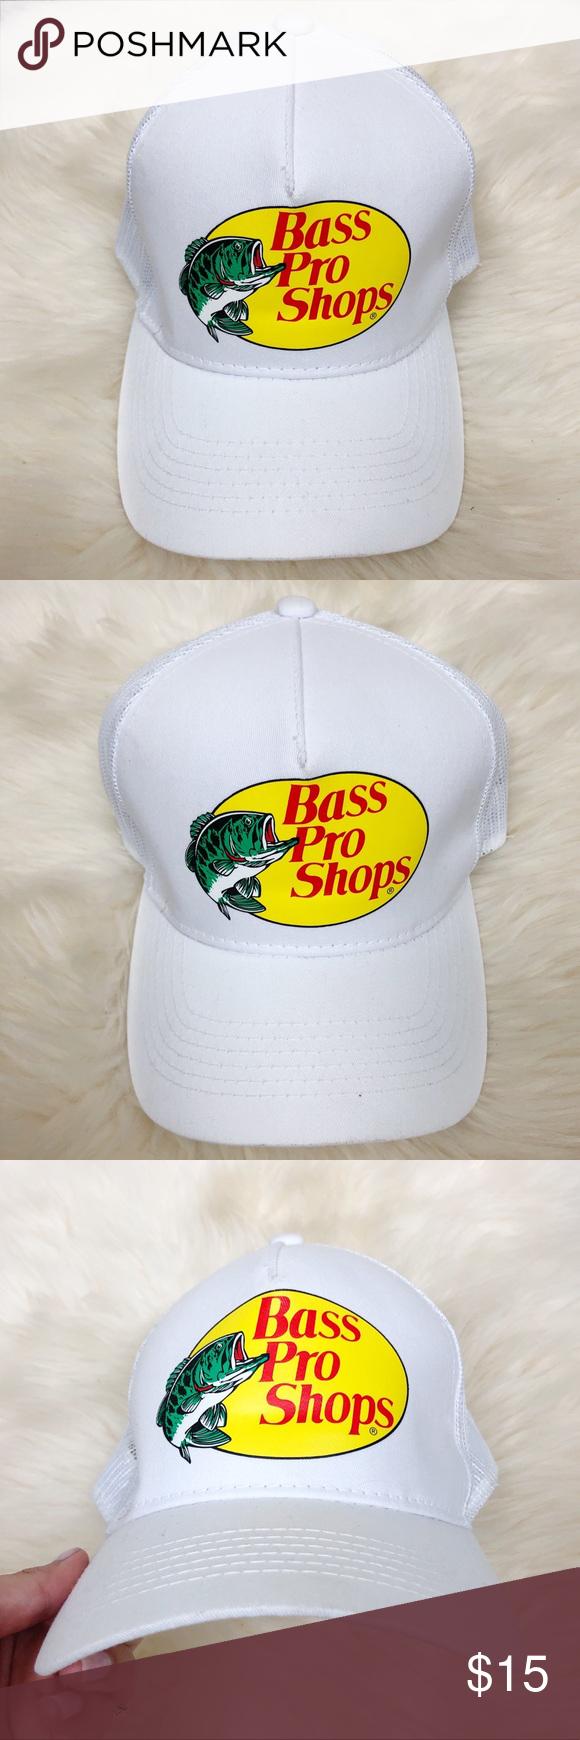 Vintage Bass Pro Shops Foam Mesh Black White Snapback Baseball Cap One Size Unbranded Baseballcap Cap Vintage Bass Bass Pro Shop Hat